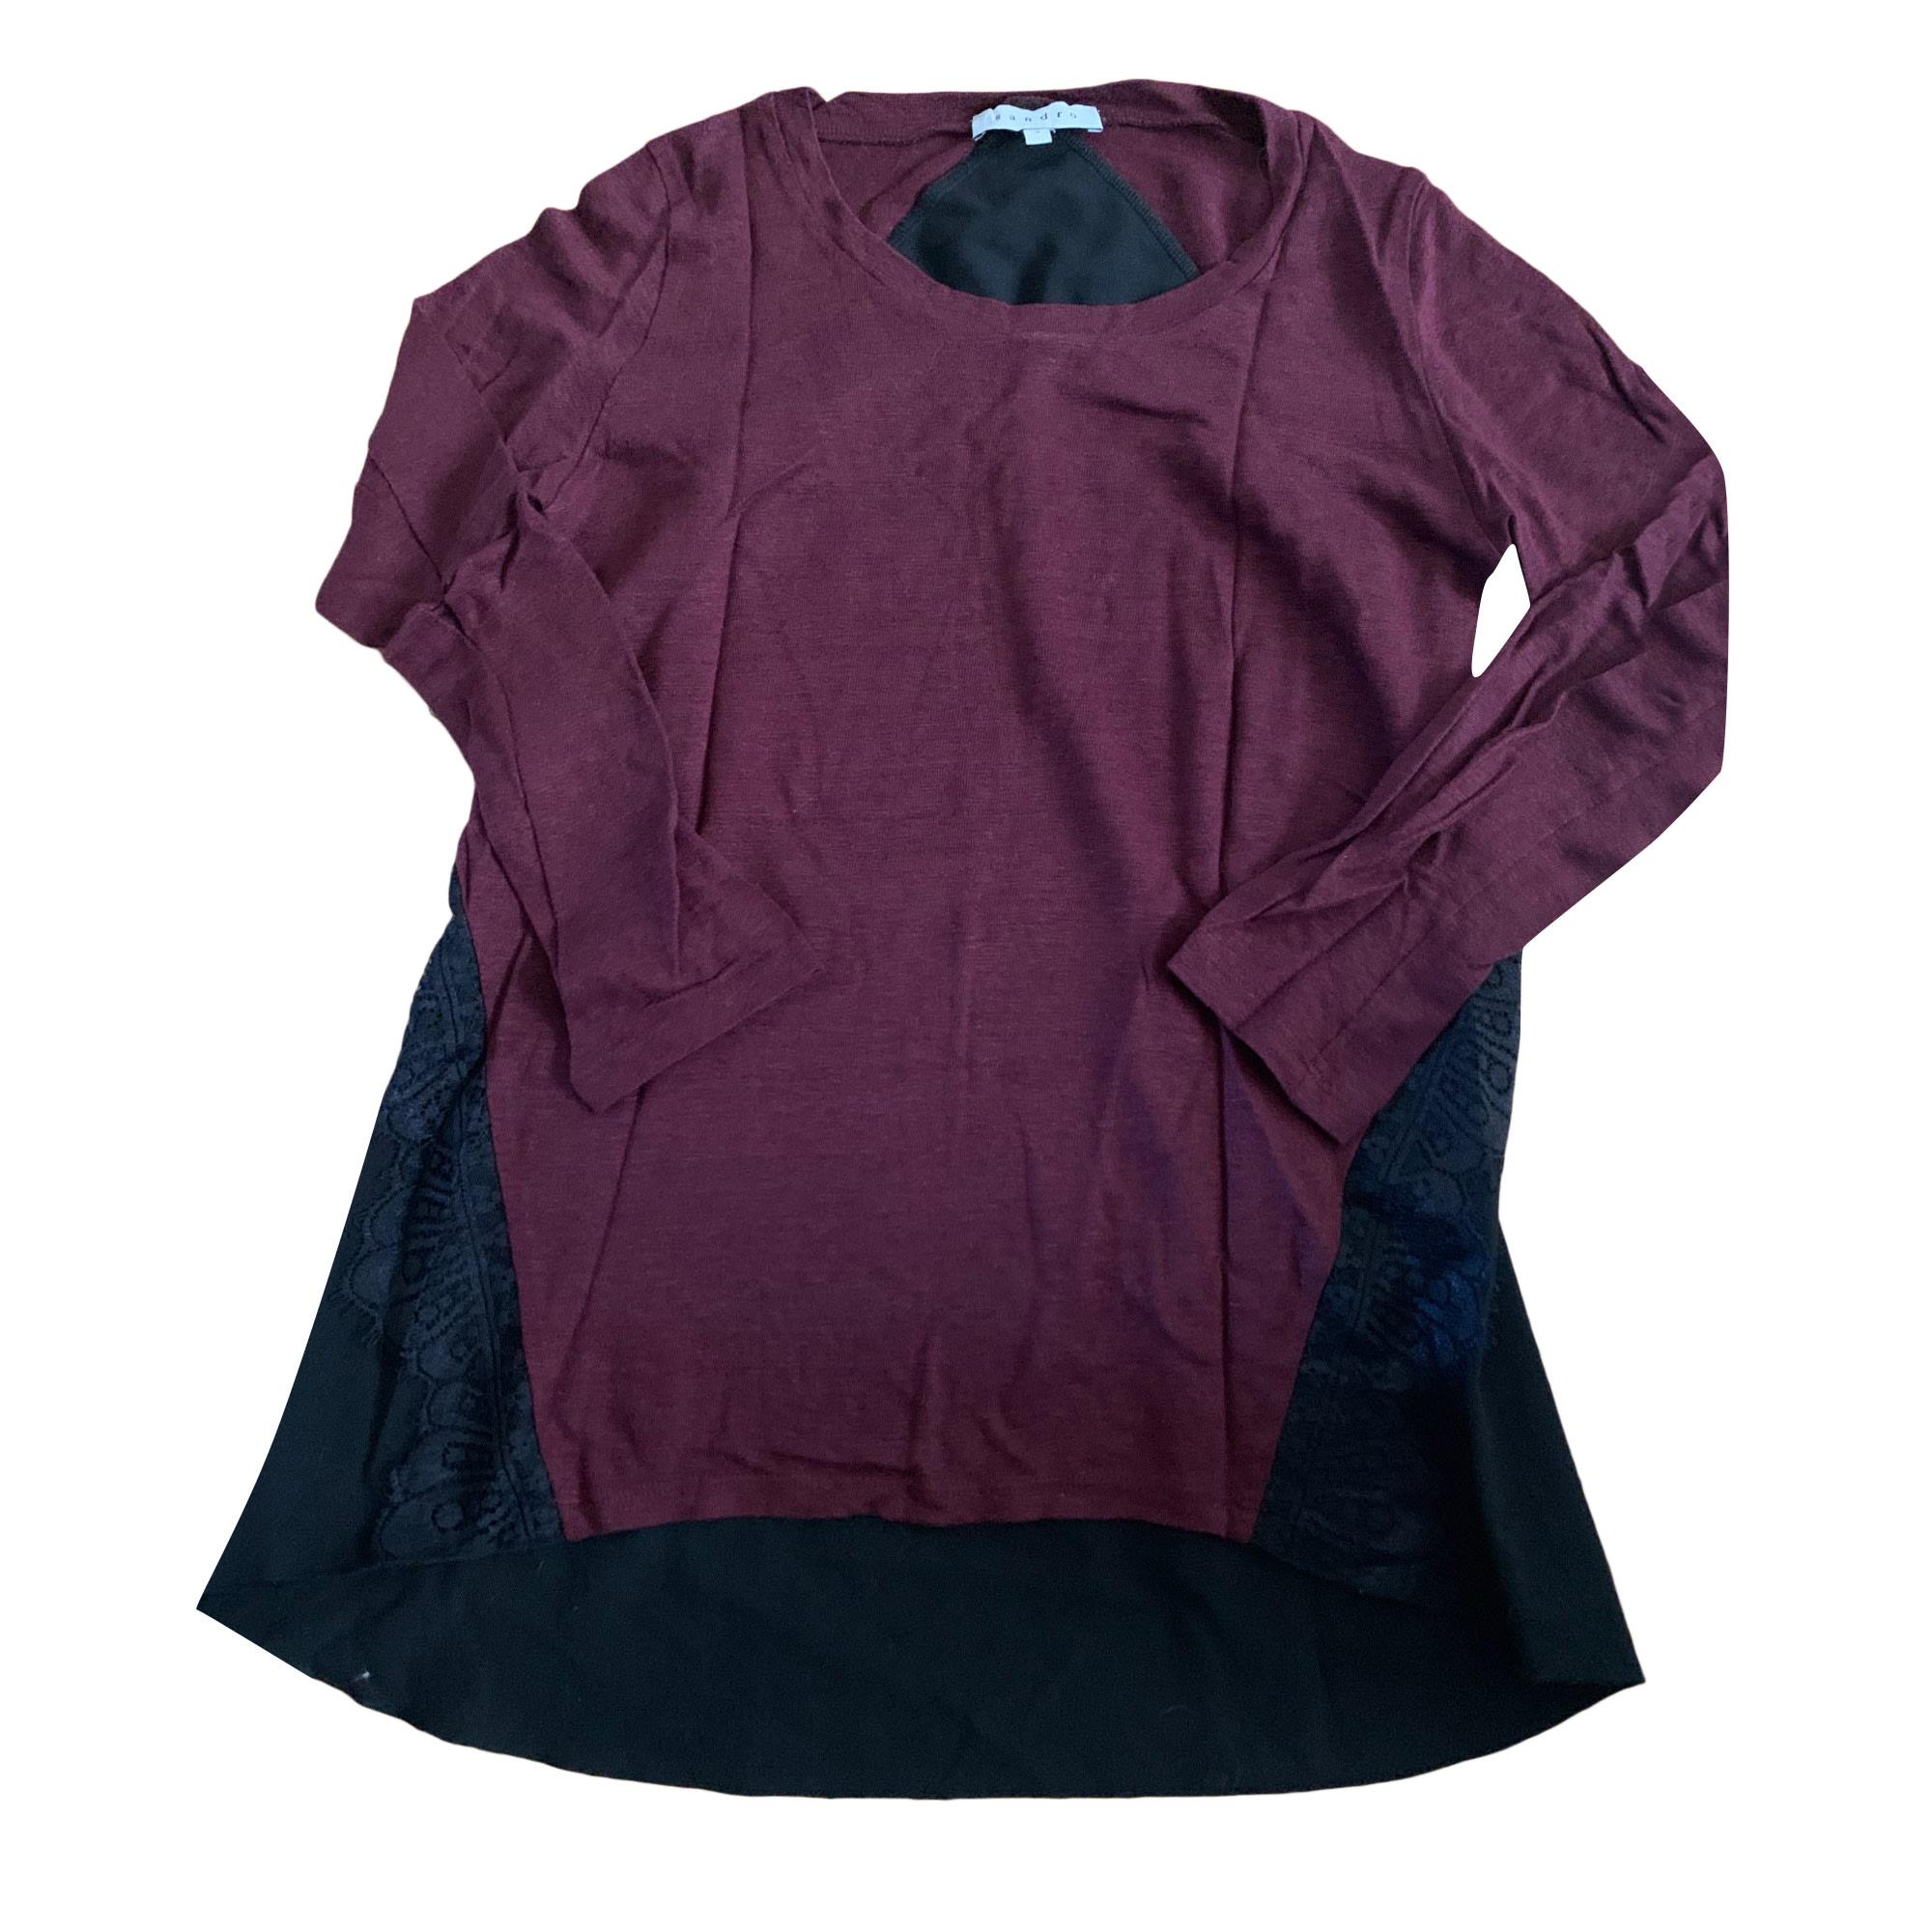 Top, tee-shirt SANDRO Rouge, bordeaux